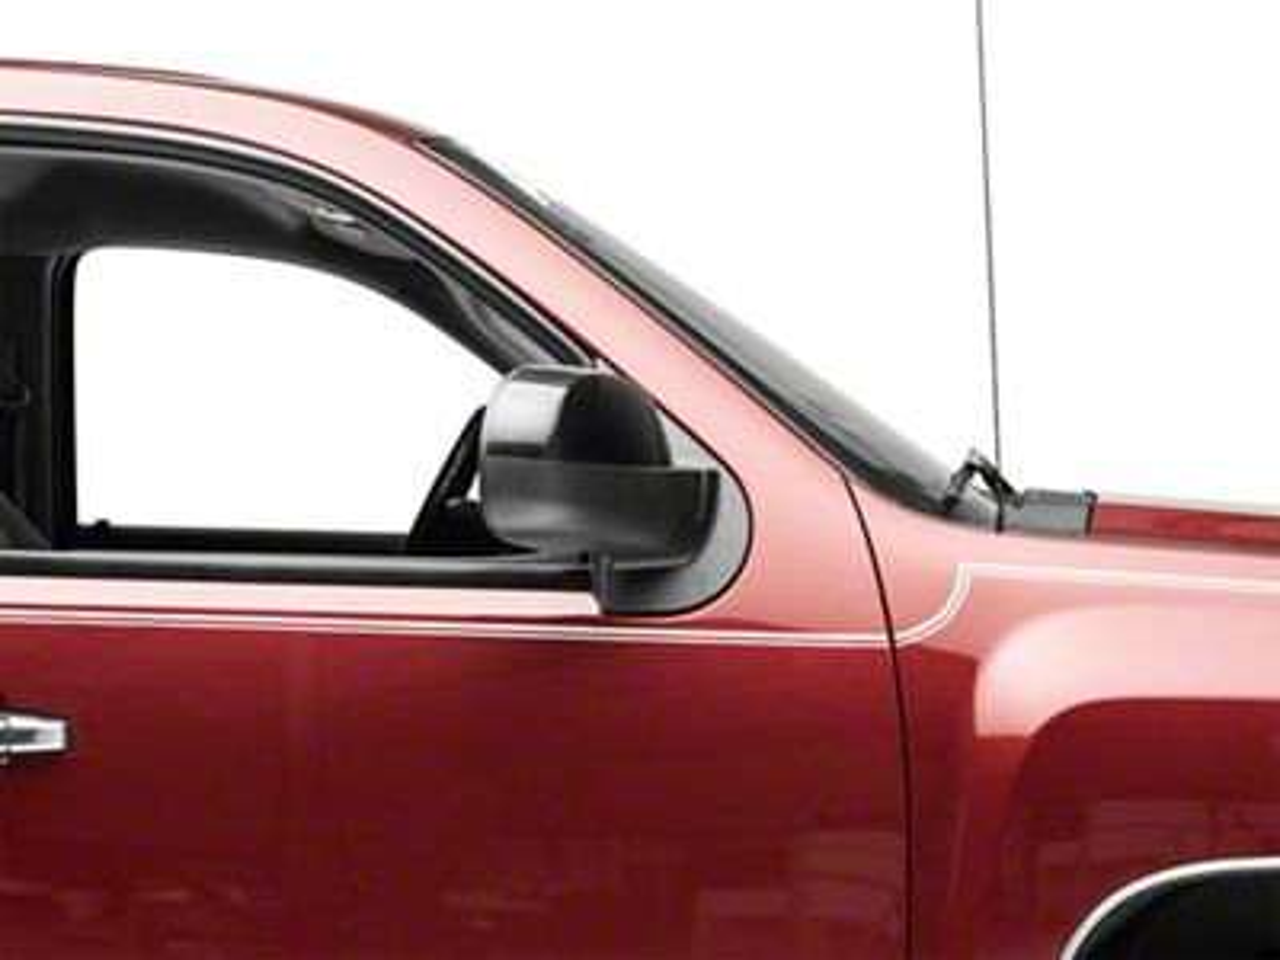 OPR Powered Heated Power Folding Mirror - Black (07-11 Silverado 1500)